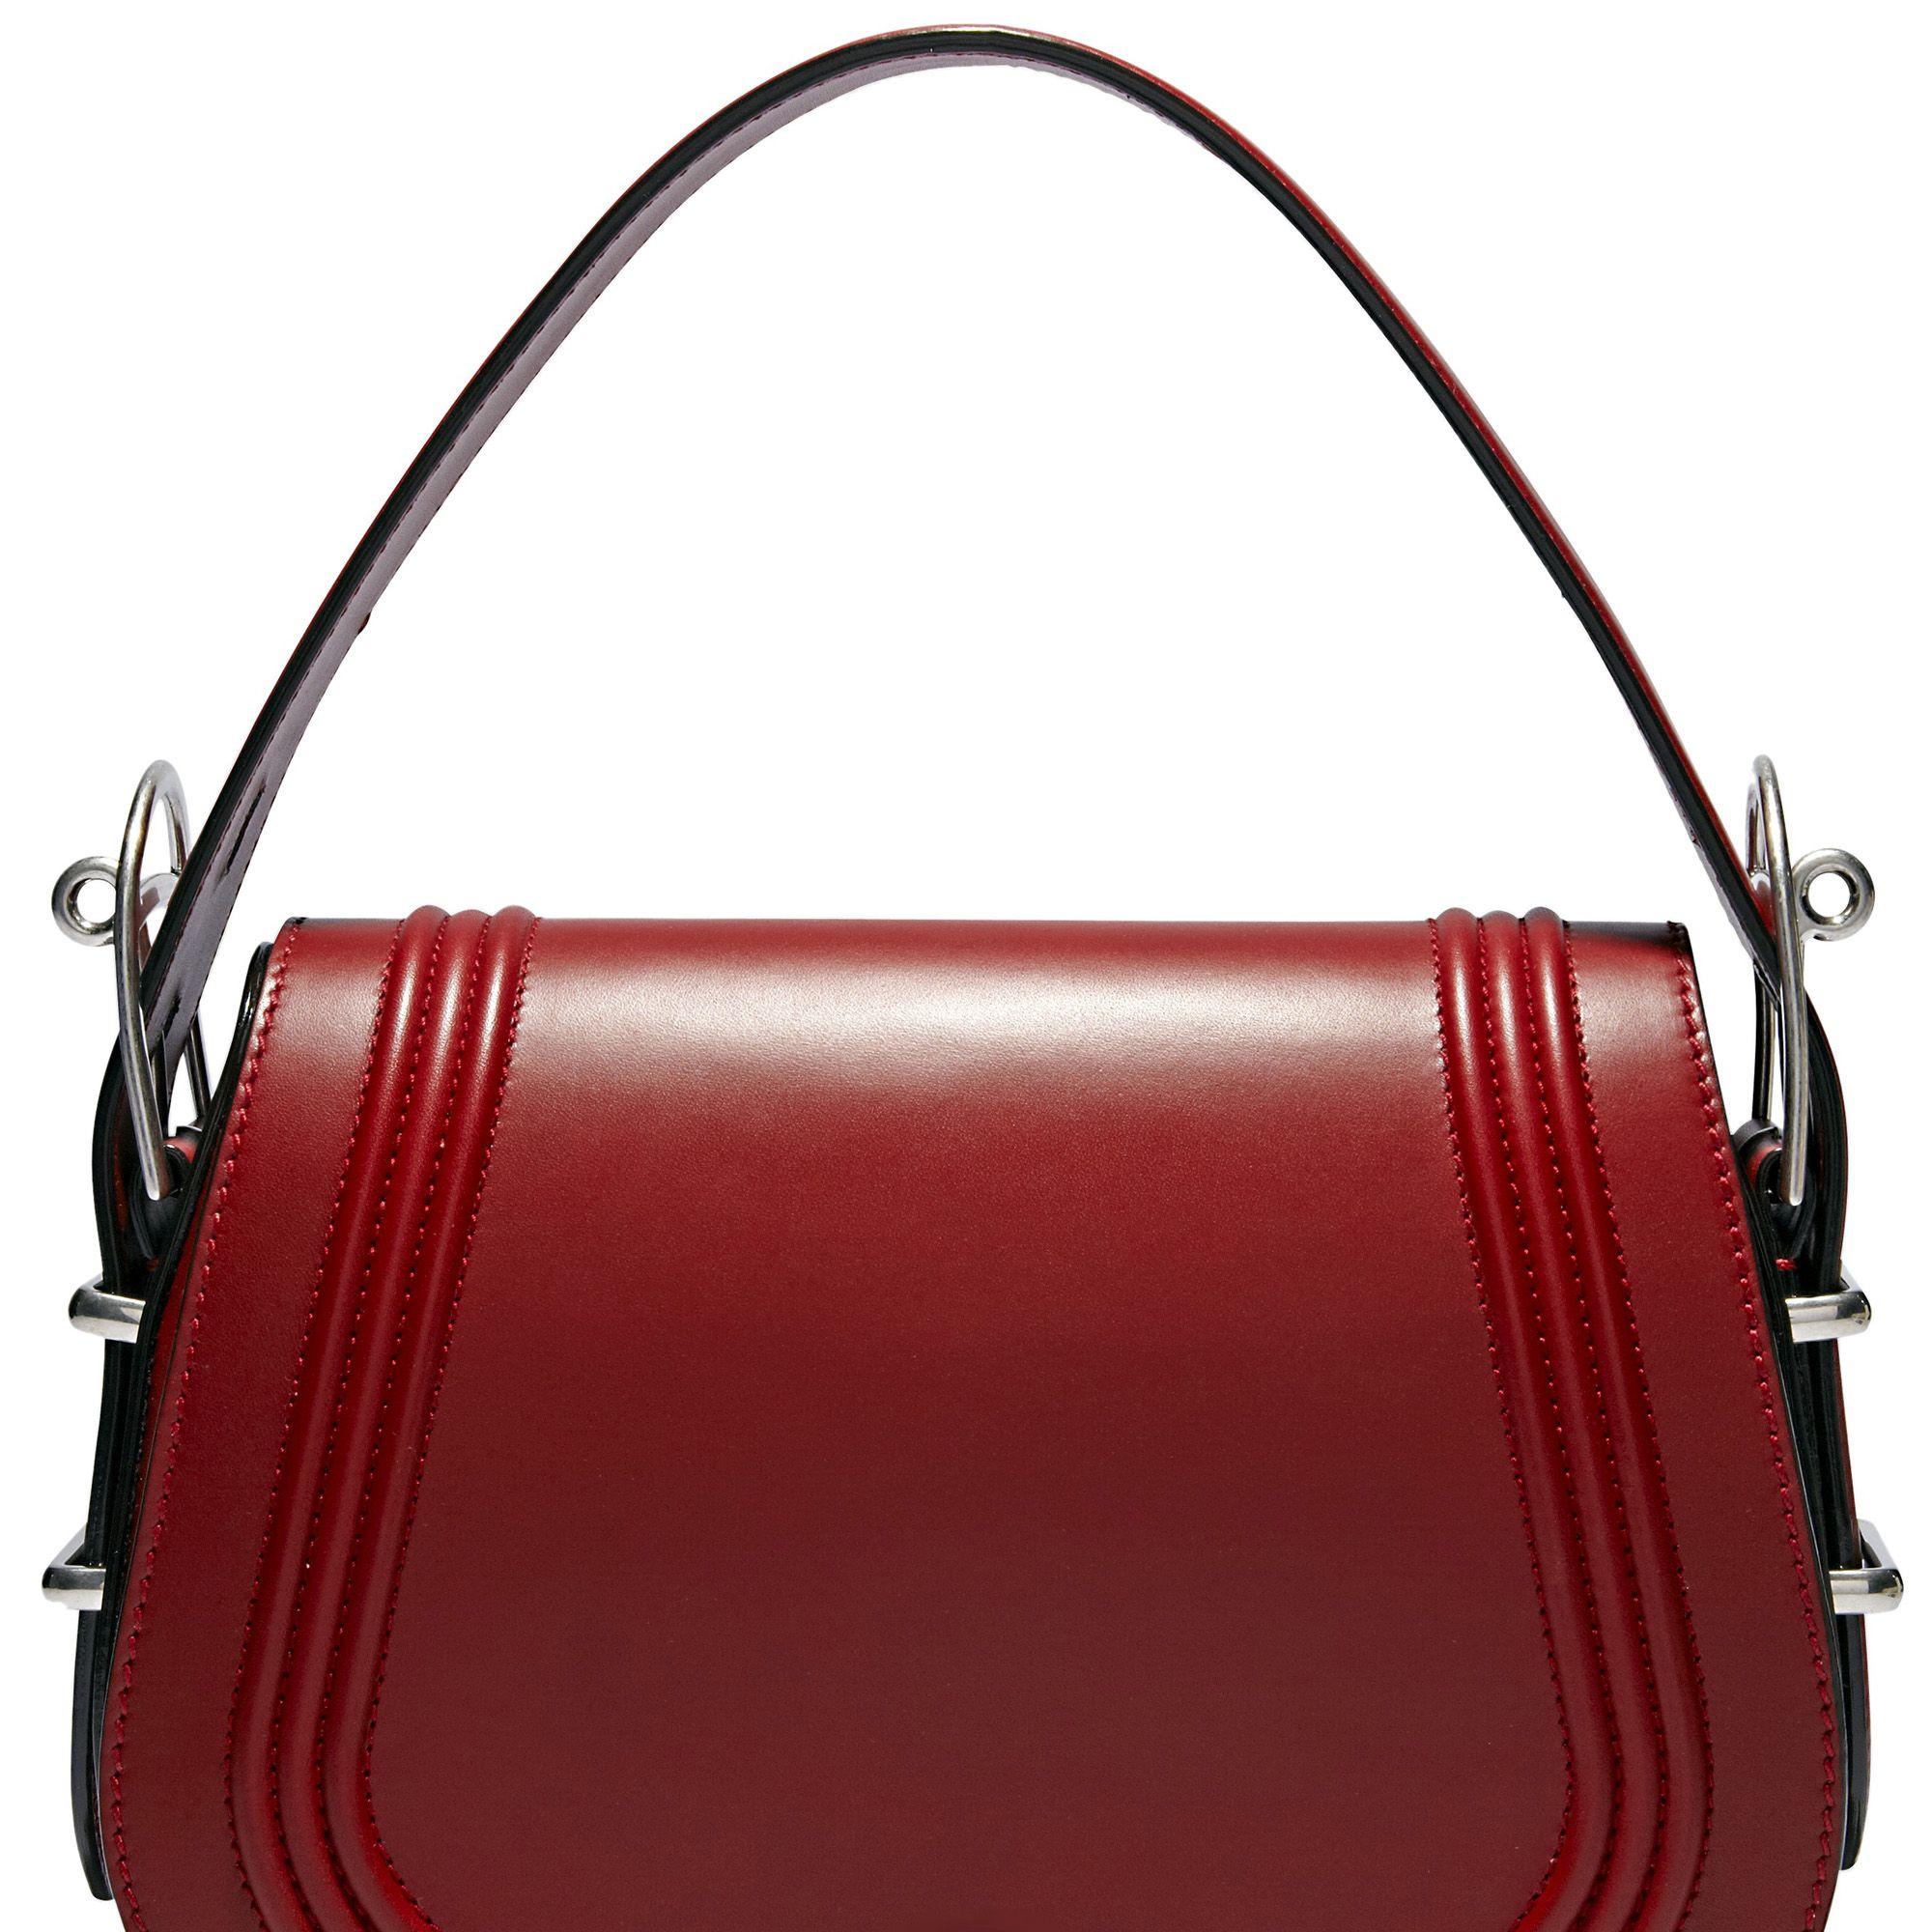 "<p><strong>Bally </strong>bag, $2,195, similar styles available at <a href=""https://shop.harpersbazaar.com/"" target=""_blank"">shopBAZAAR.com</a>.</p>"